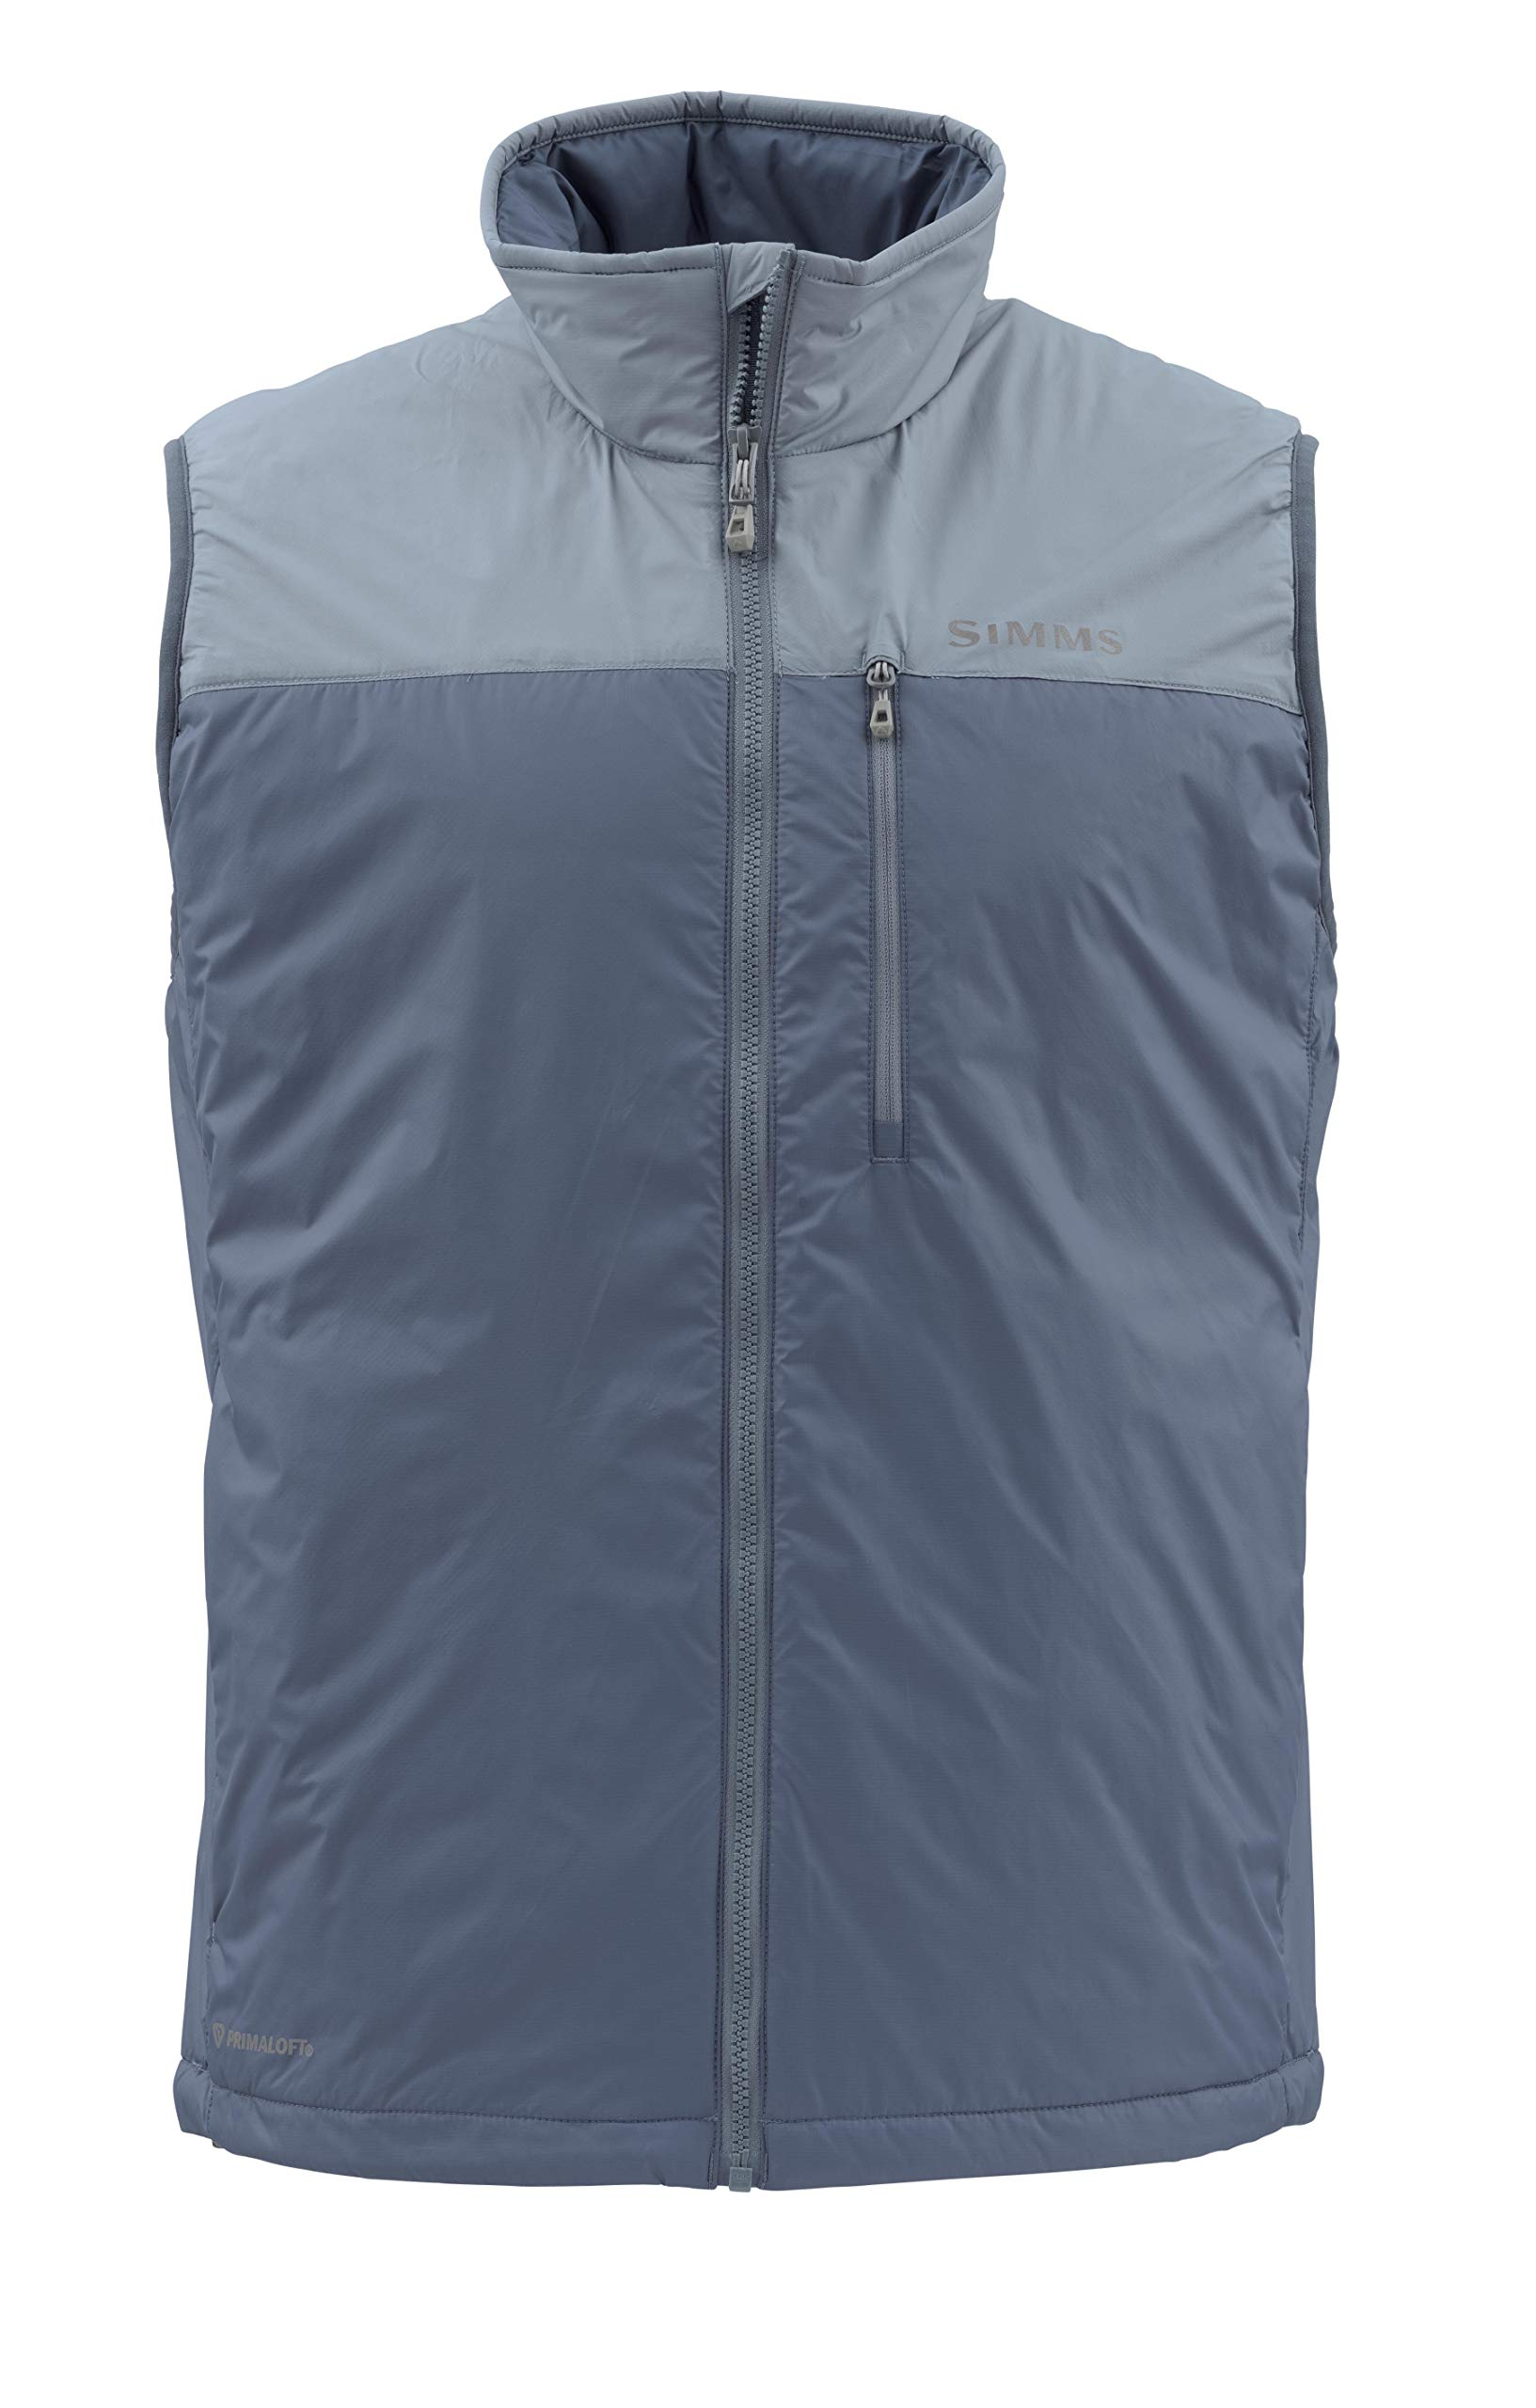 Simms Men's Midstream Insulated Puffy Vest, Sleeveless Jacket